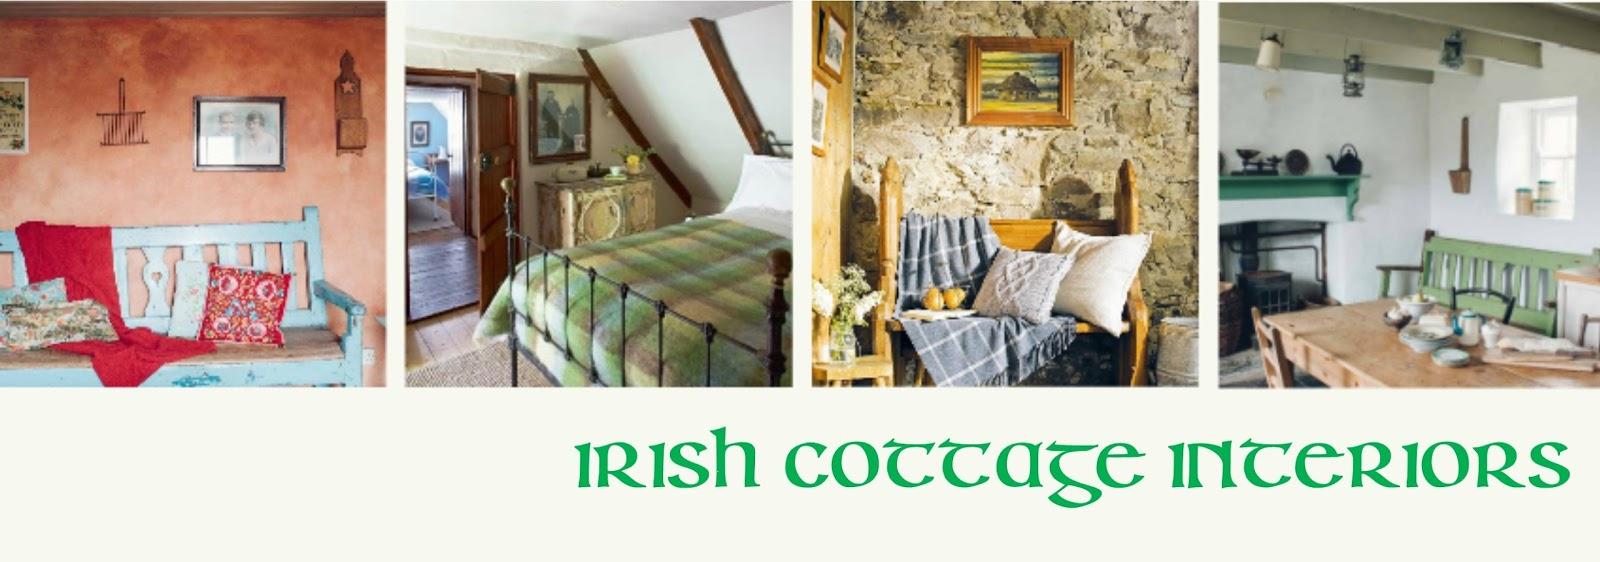 The Global Villa Irish Cottage Interiors